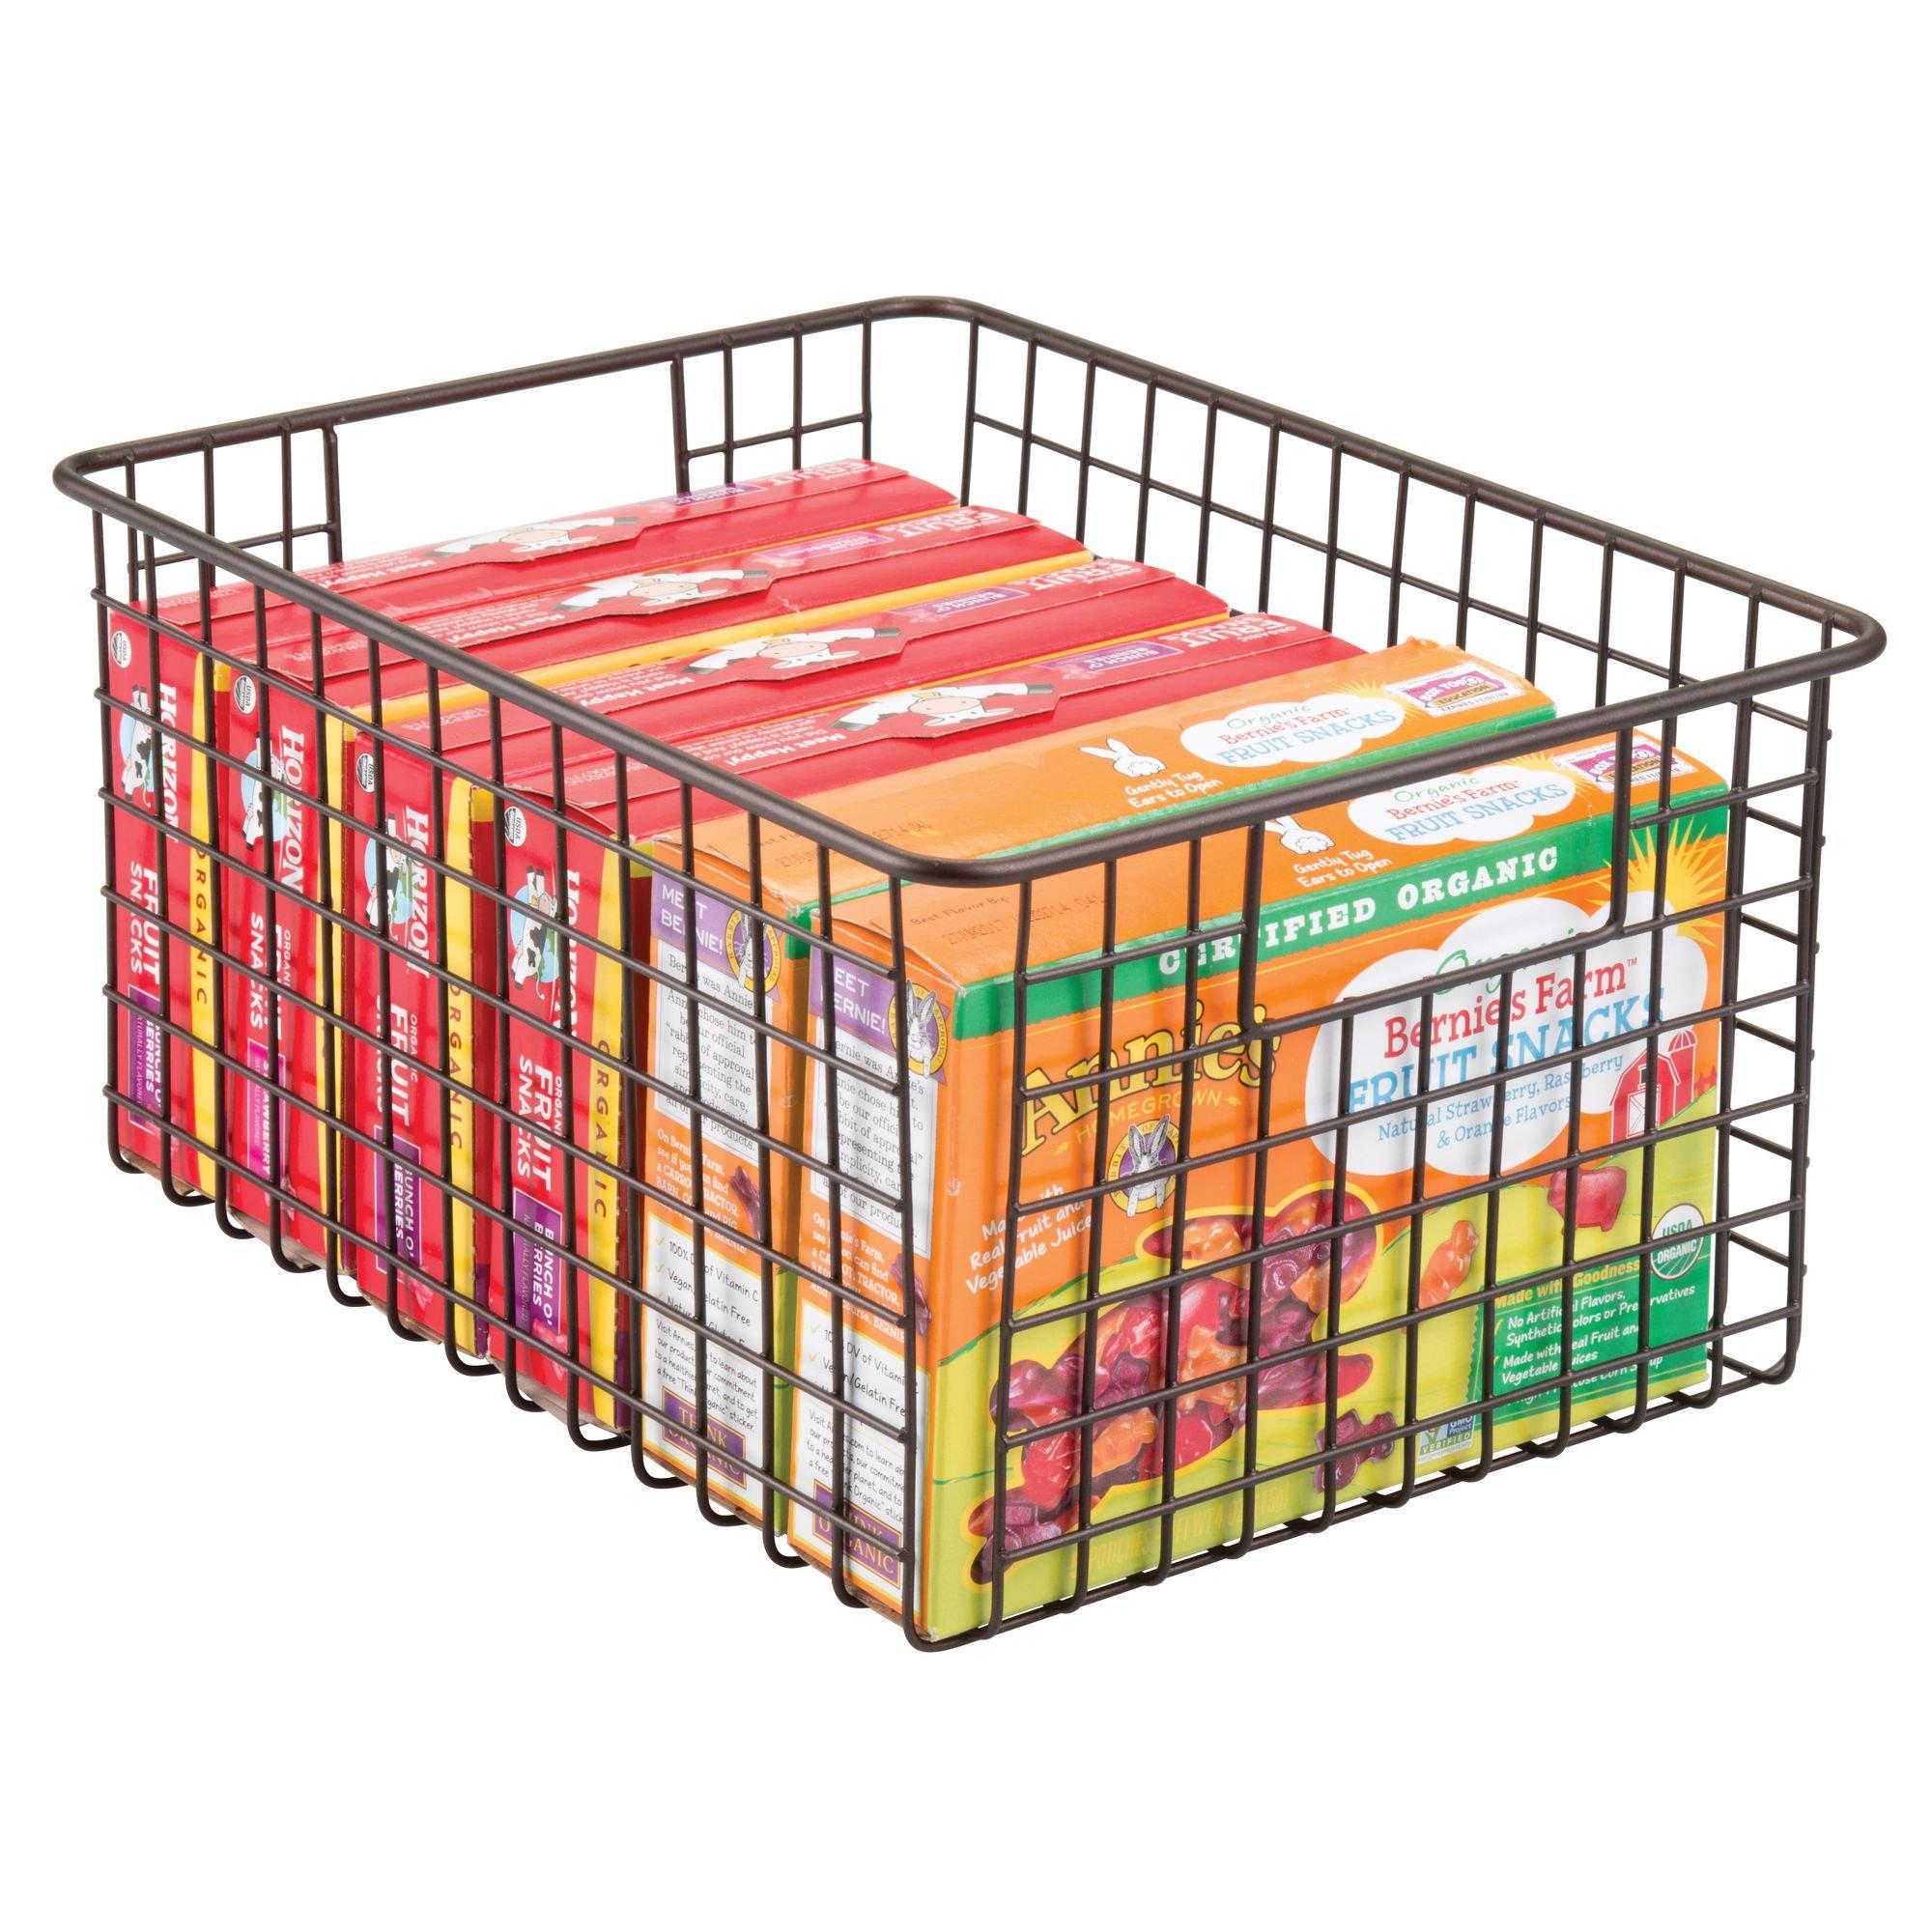 mDesign Kitchen Pantry Bathroom Office Garage Freezer Food Shelf Storage Organizer Heavy Duty Metal Wire Mesh Bins Baskets with Handles, 12'' x 9'' x 6'' - Set of 2, Bronze by mDesign (Image #2)